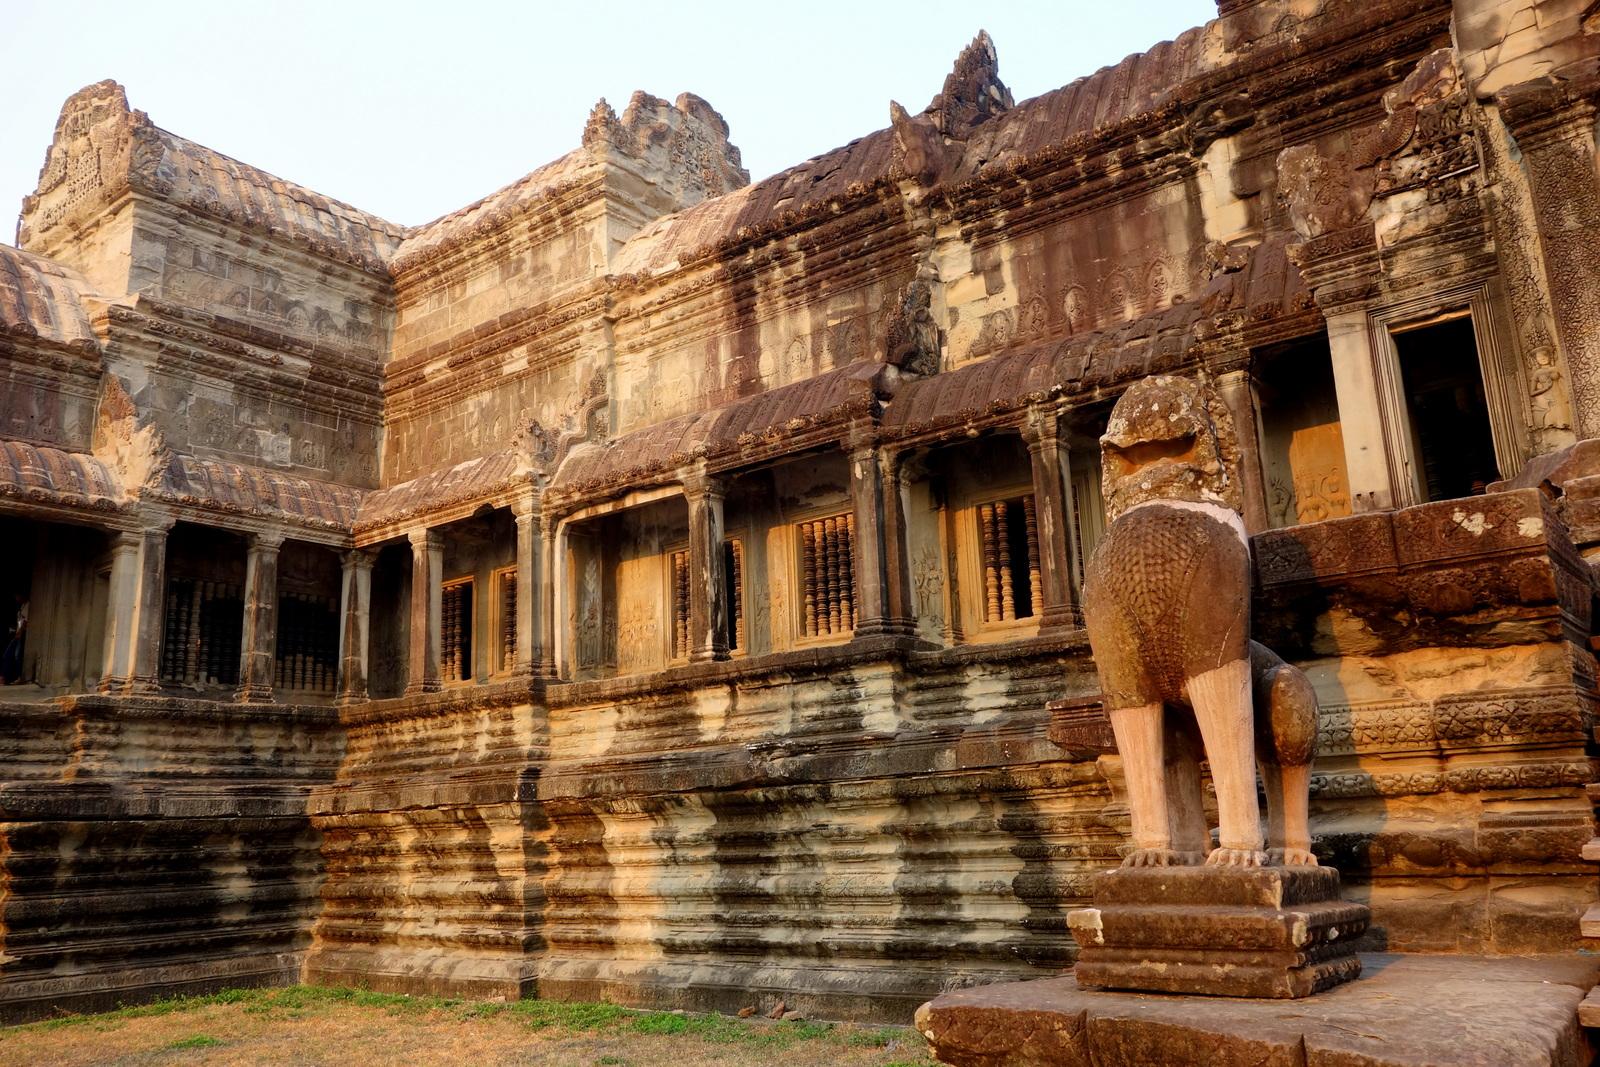 CAMBODIA ~ Angkor Thom, Ta Prohm and Angkor Wat for Sunset